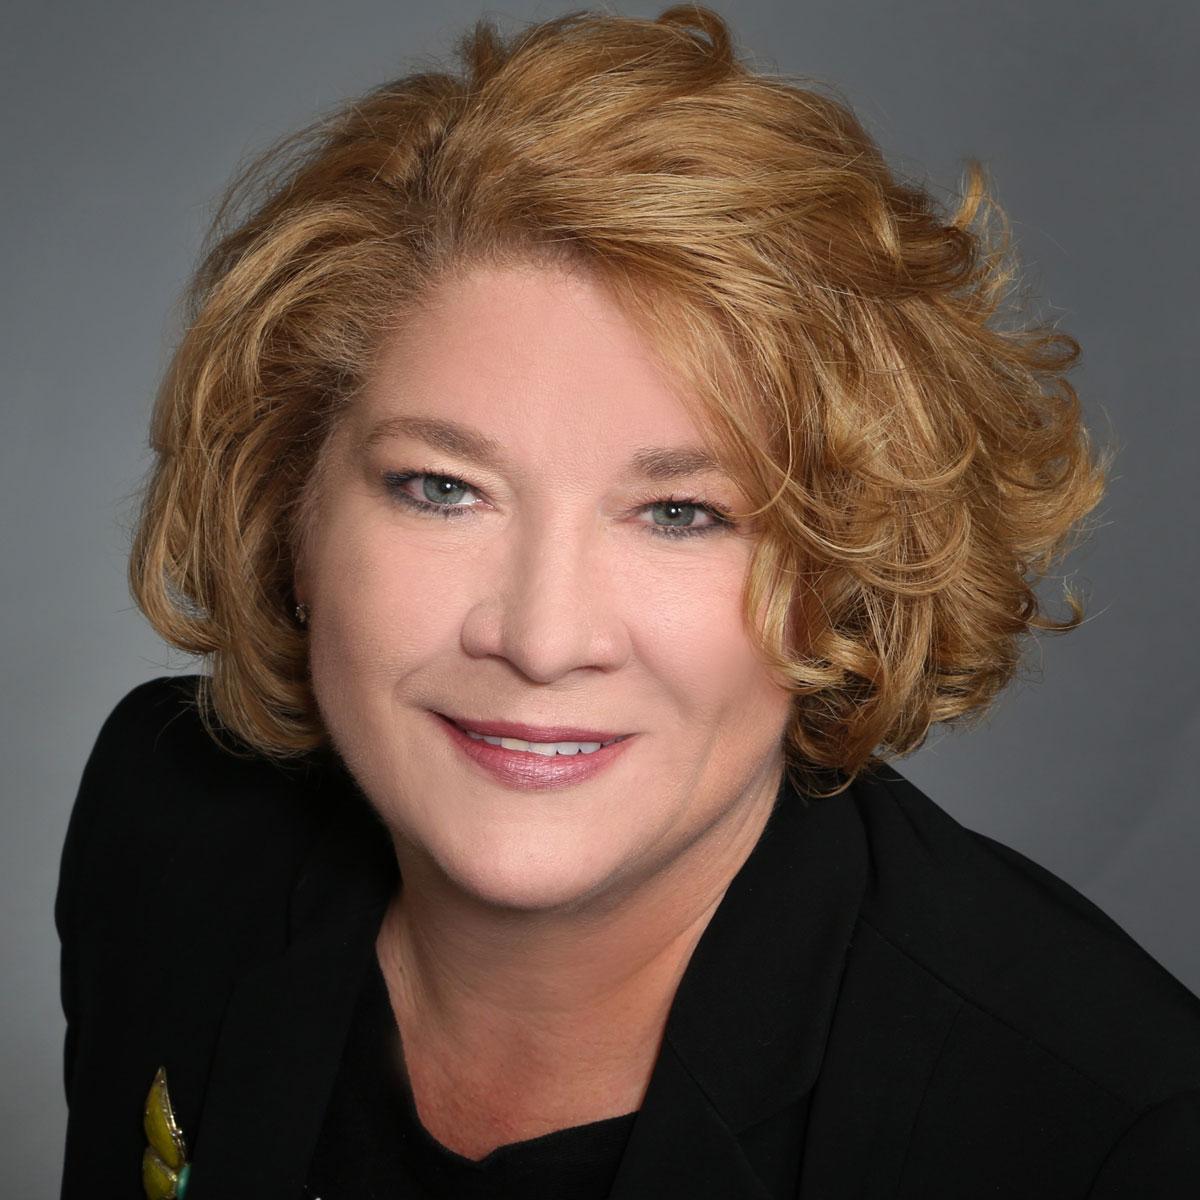 Cheryl-Gardner-Director-Human-Resources-Business Services